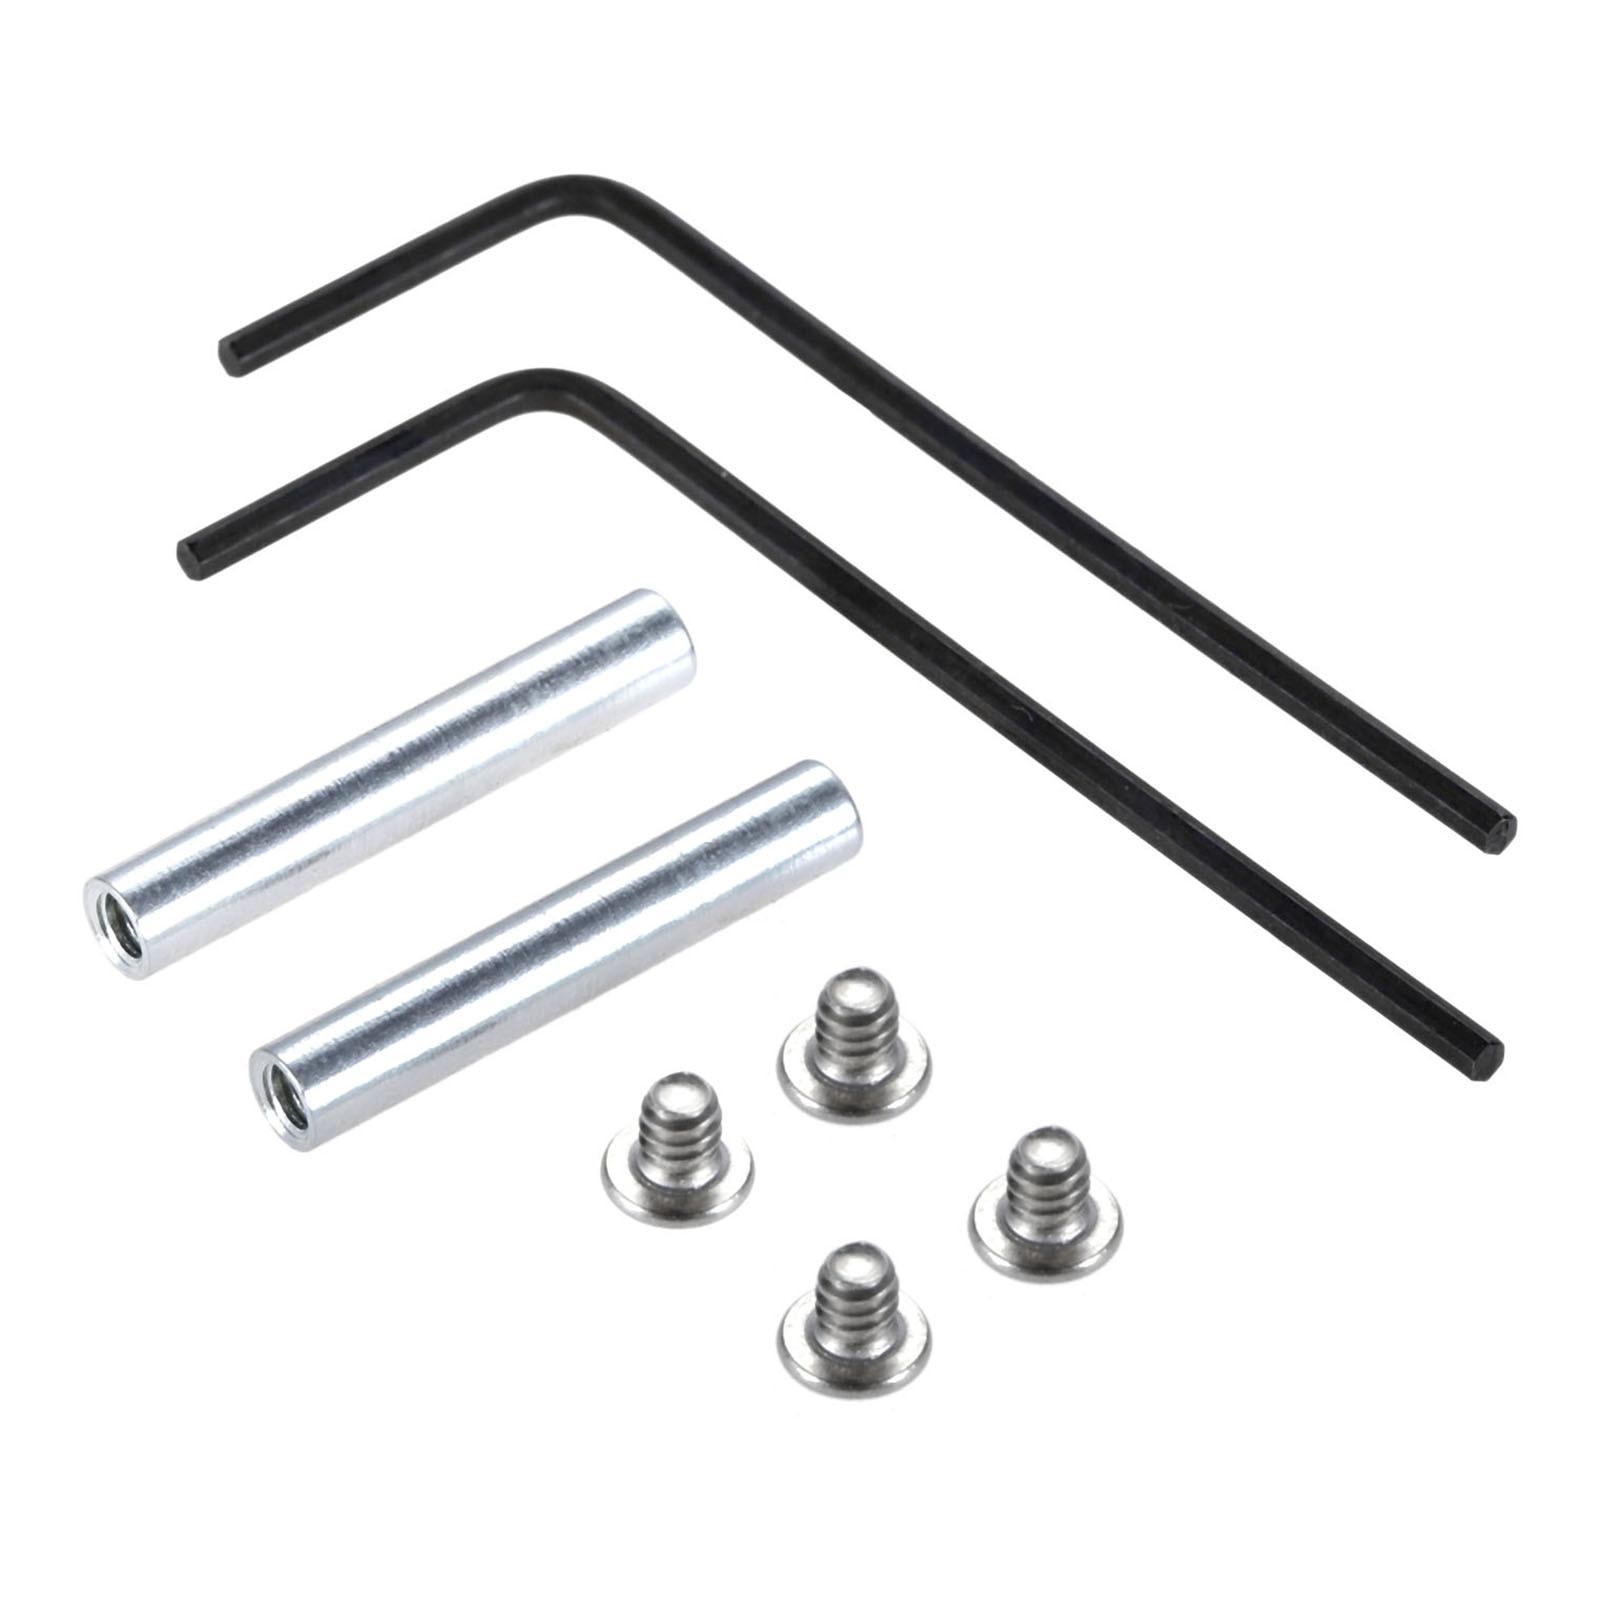 Anti-Walk Hammer Trigger Pins Stainless Steel Screw Accessories